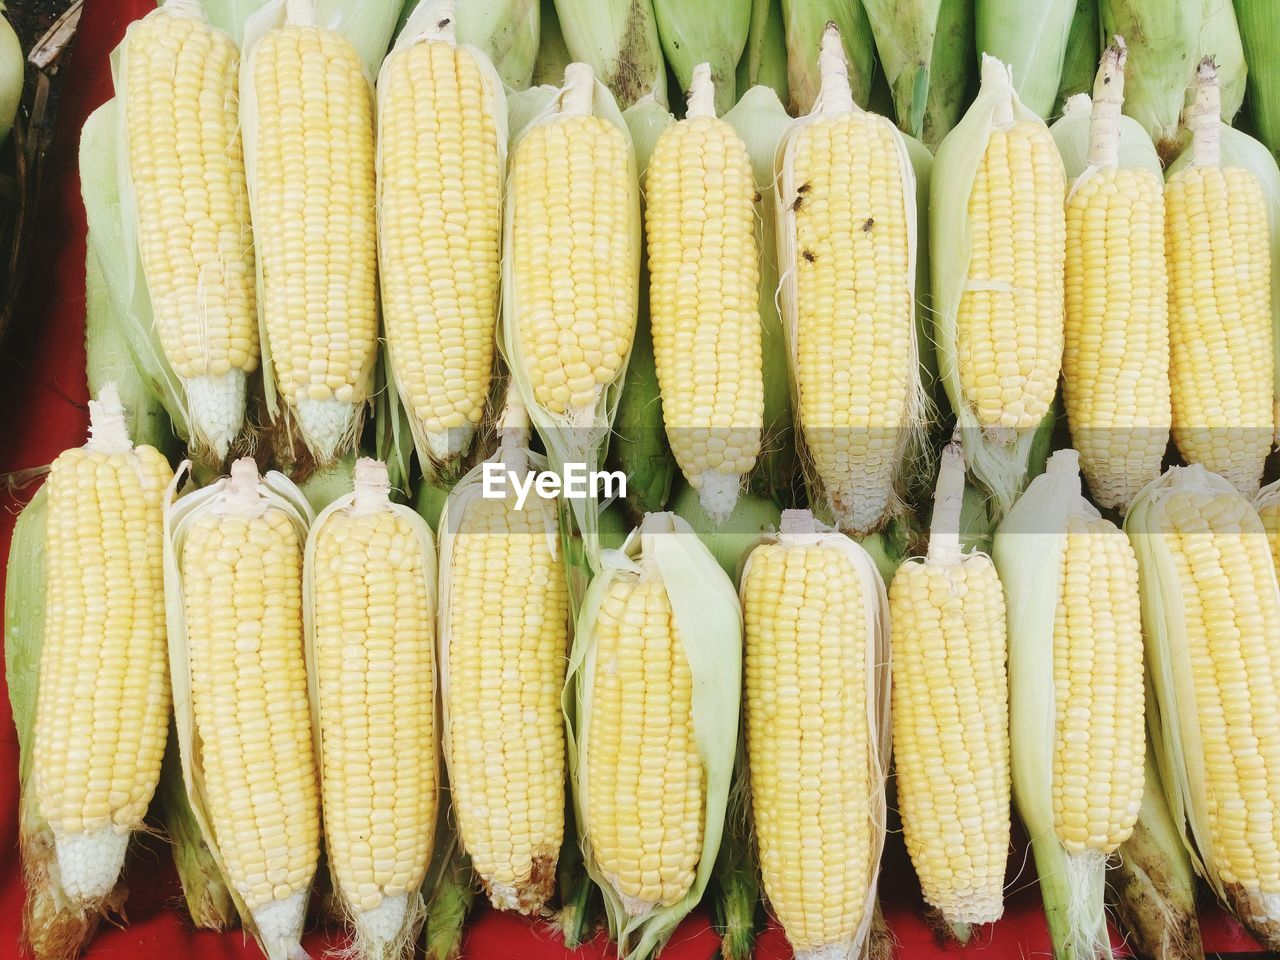 Close-Up Of Sweet Corn